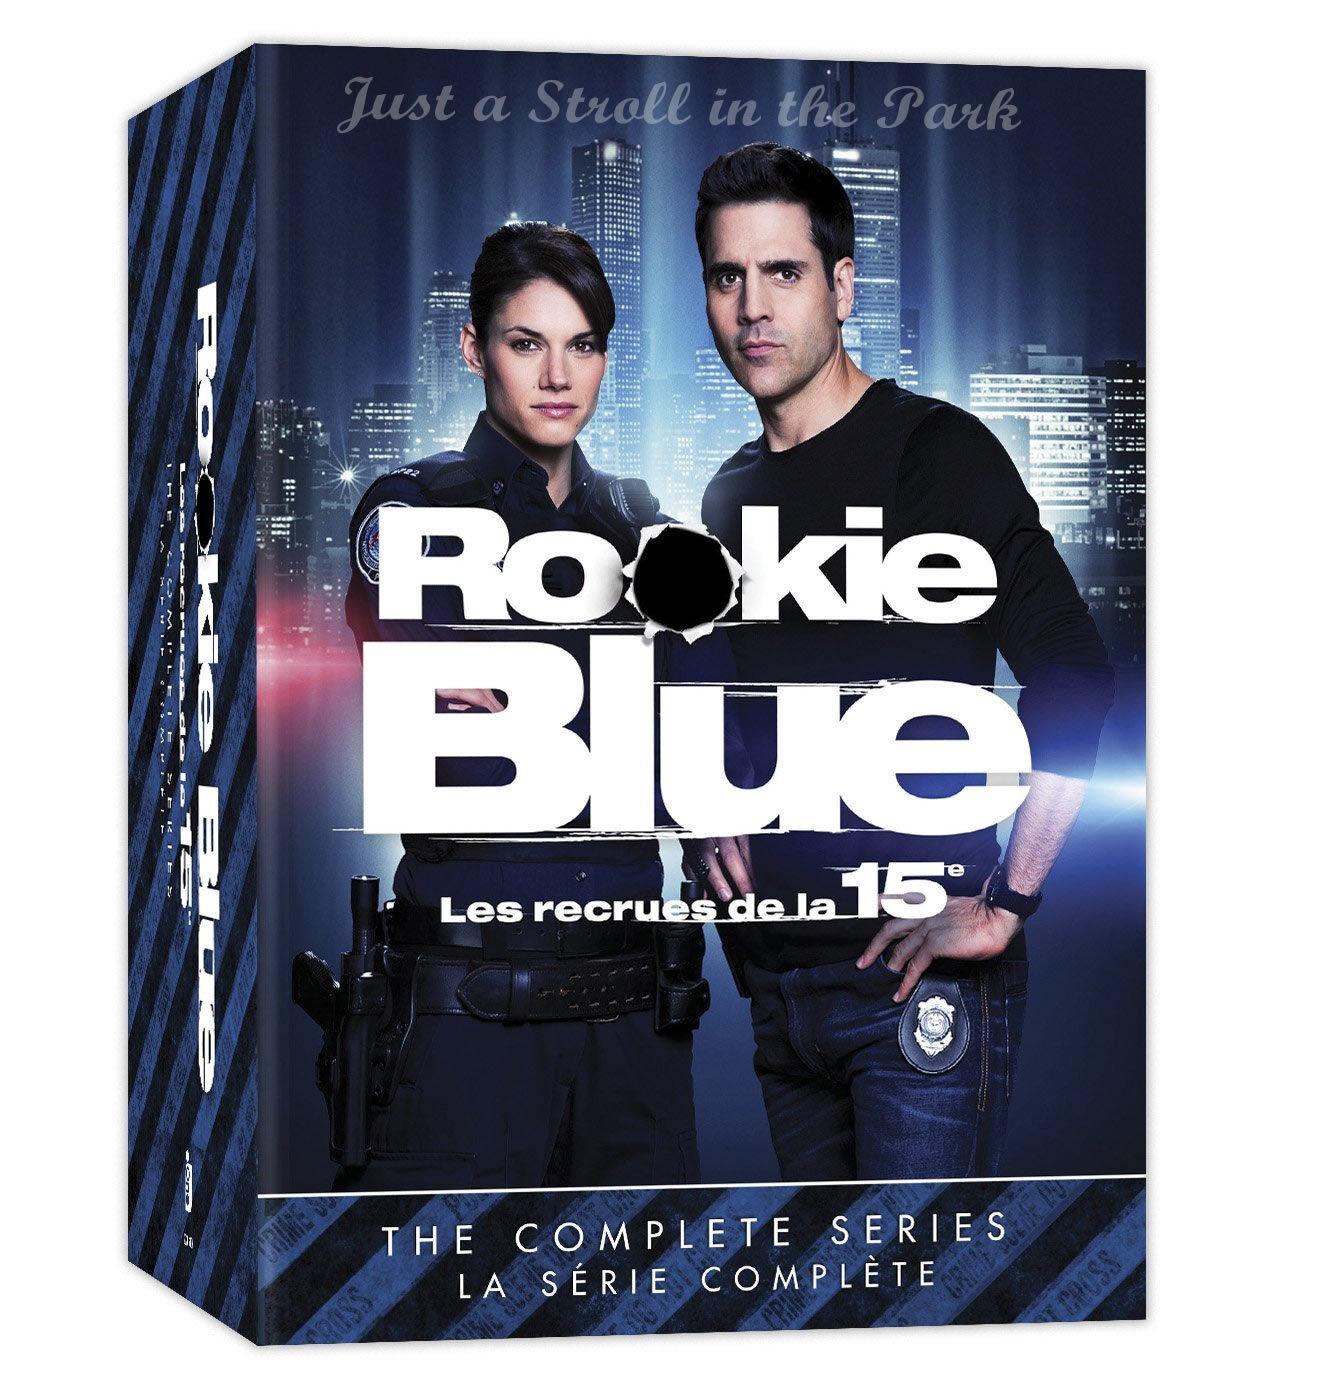 Rookie Blue Complete TV Series Season 1 2 3 4 5 6 (Final